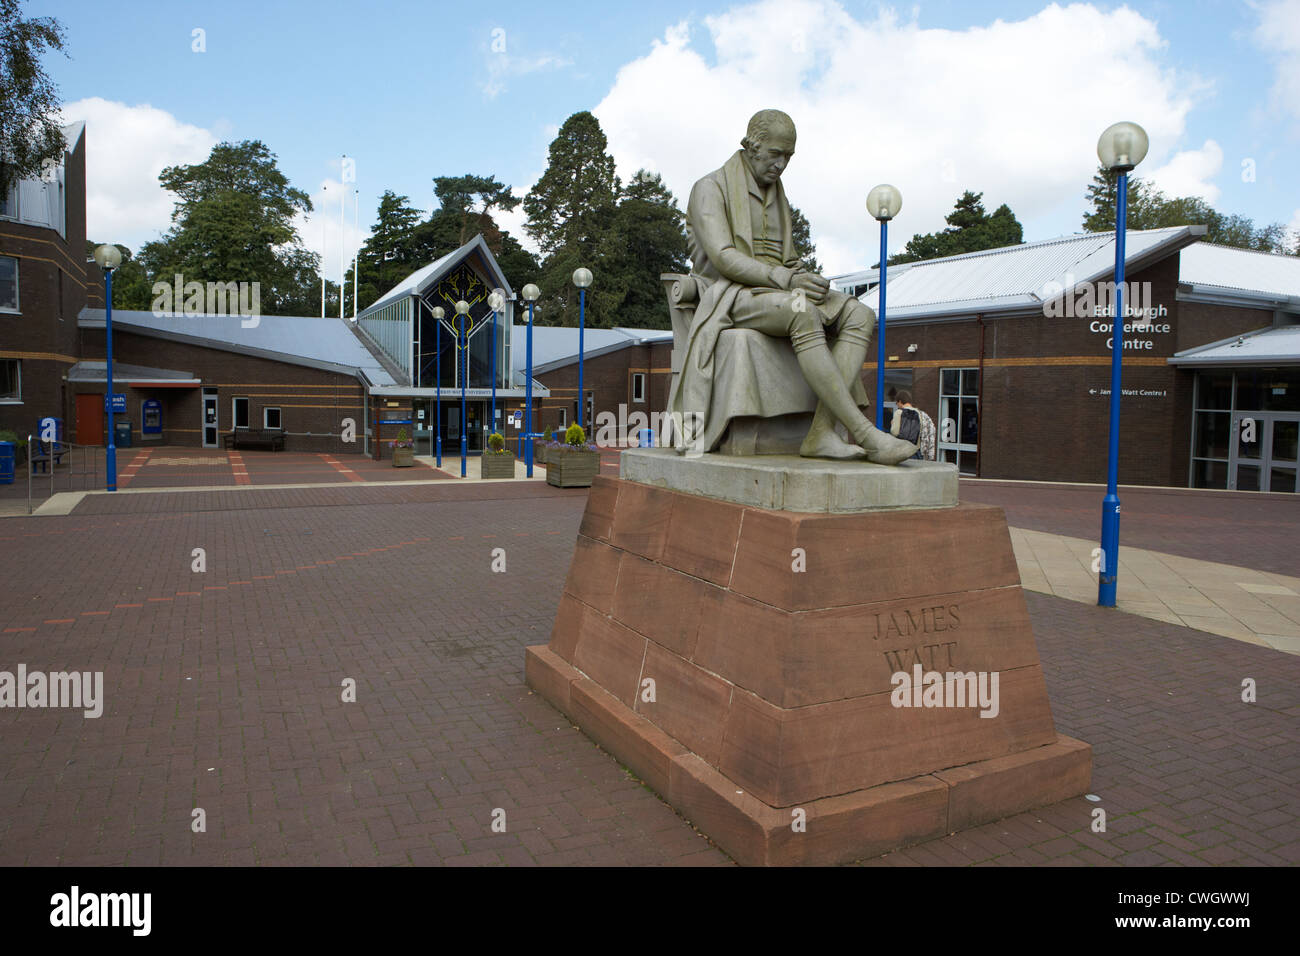 james watt statue outside heriot watt university edinburgh, scotland, uk, united kingdom - Stock Image